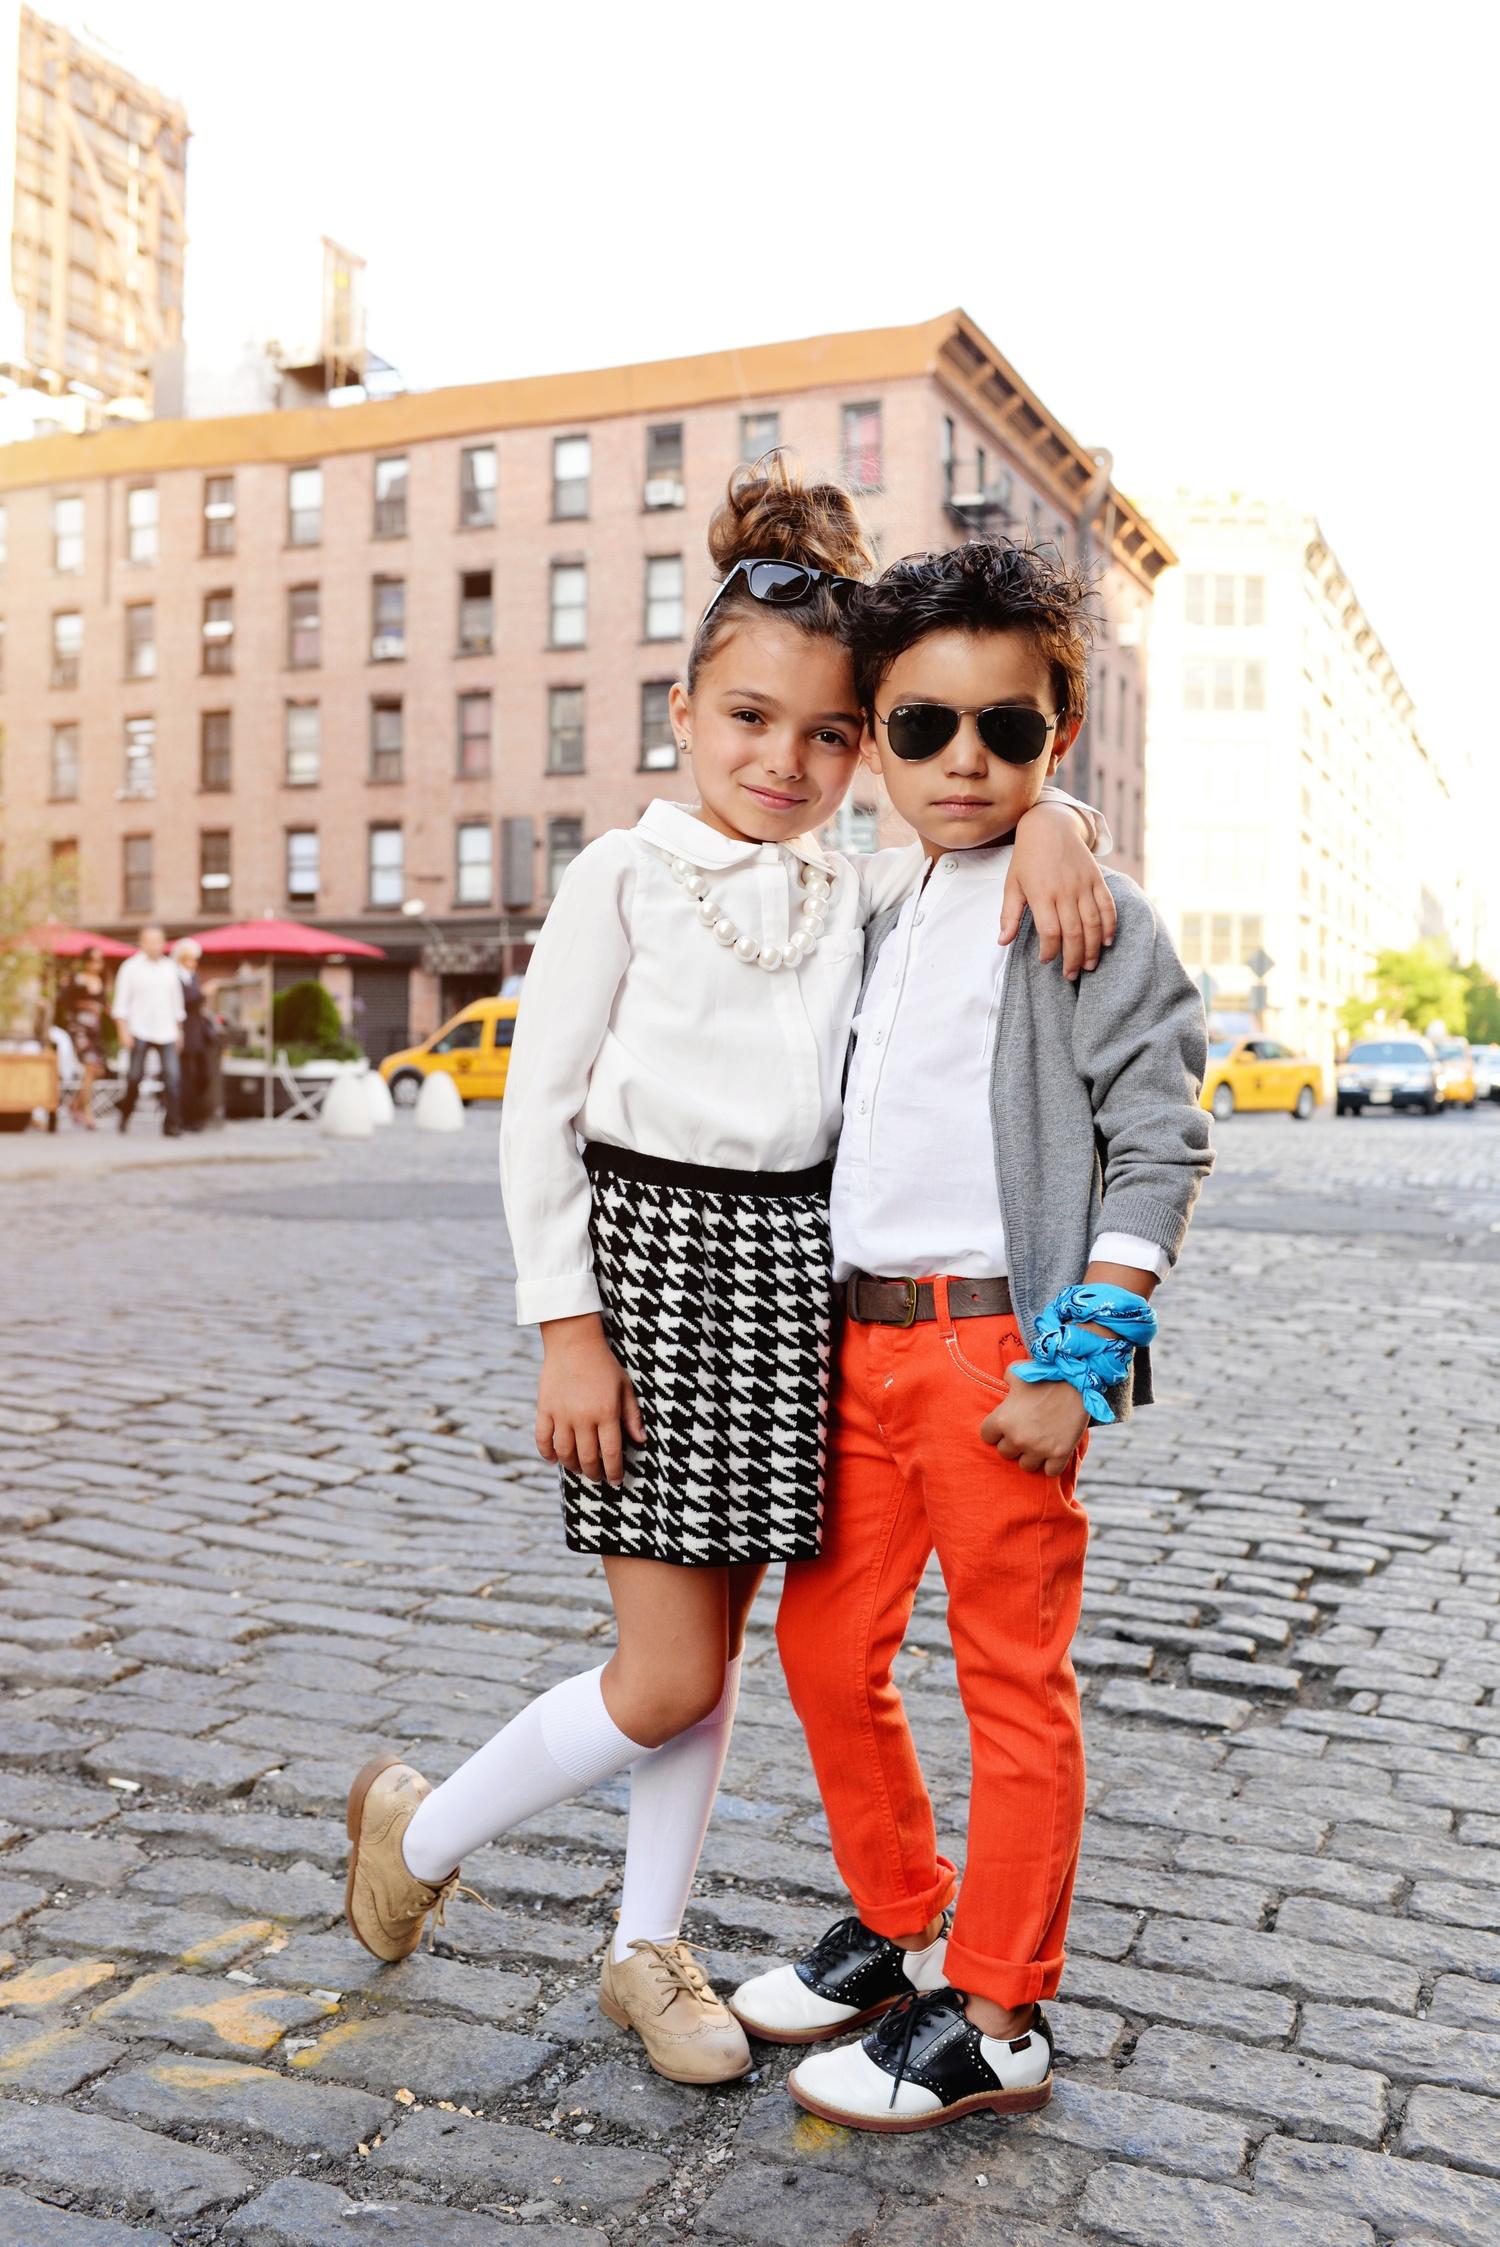 Enfant+Street+Style+by+Gina+Kim+Photography-68.jpeg